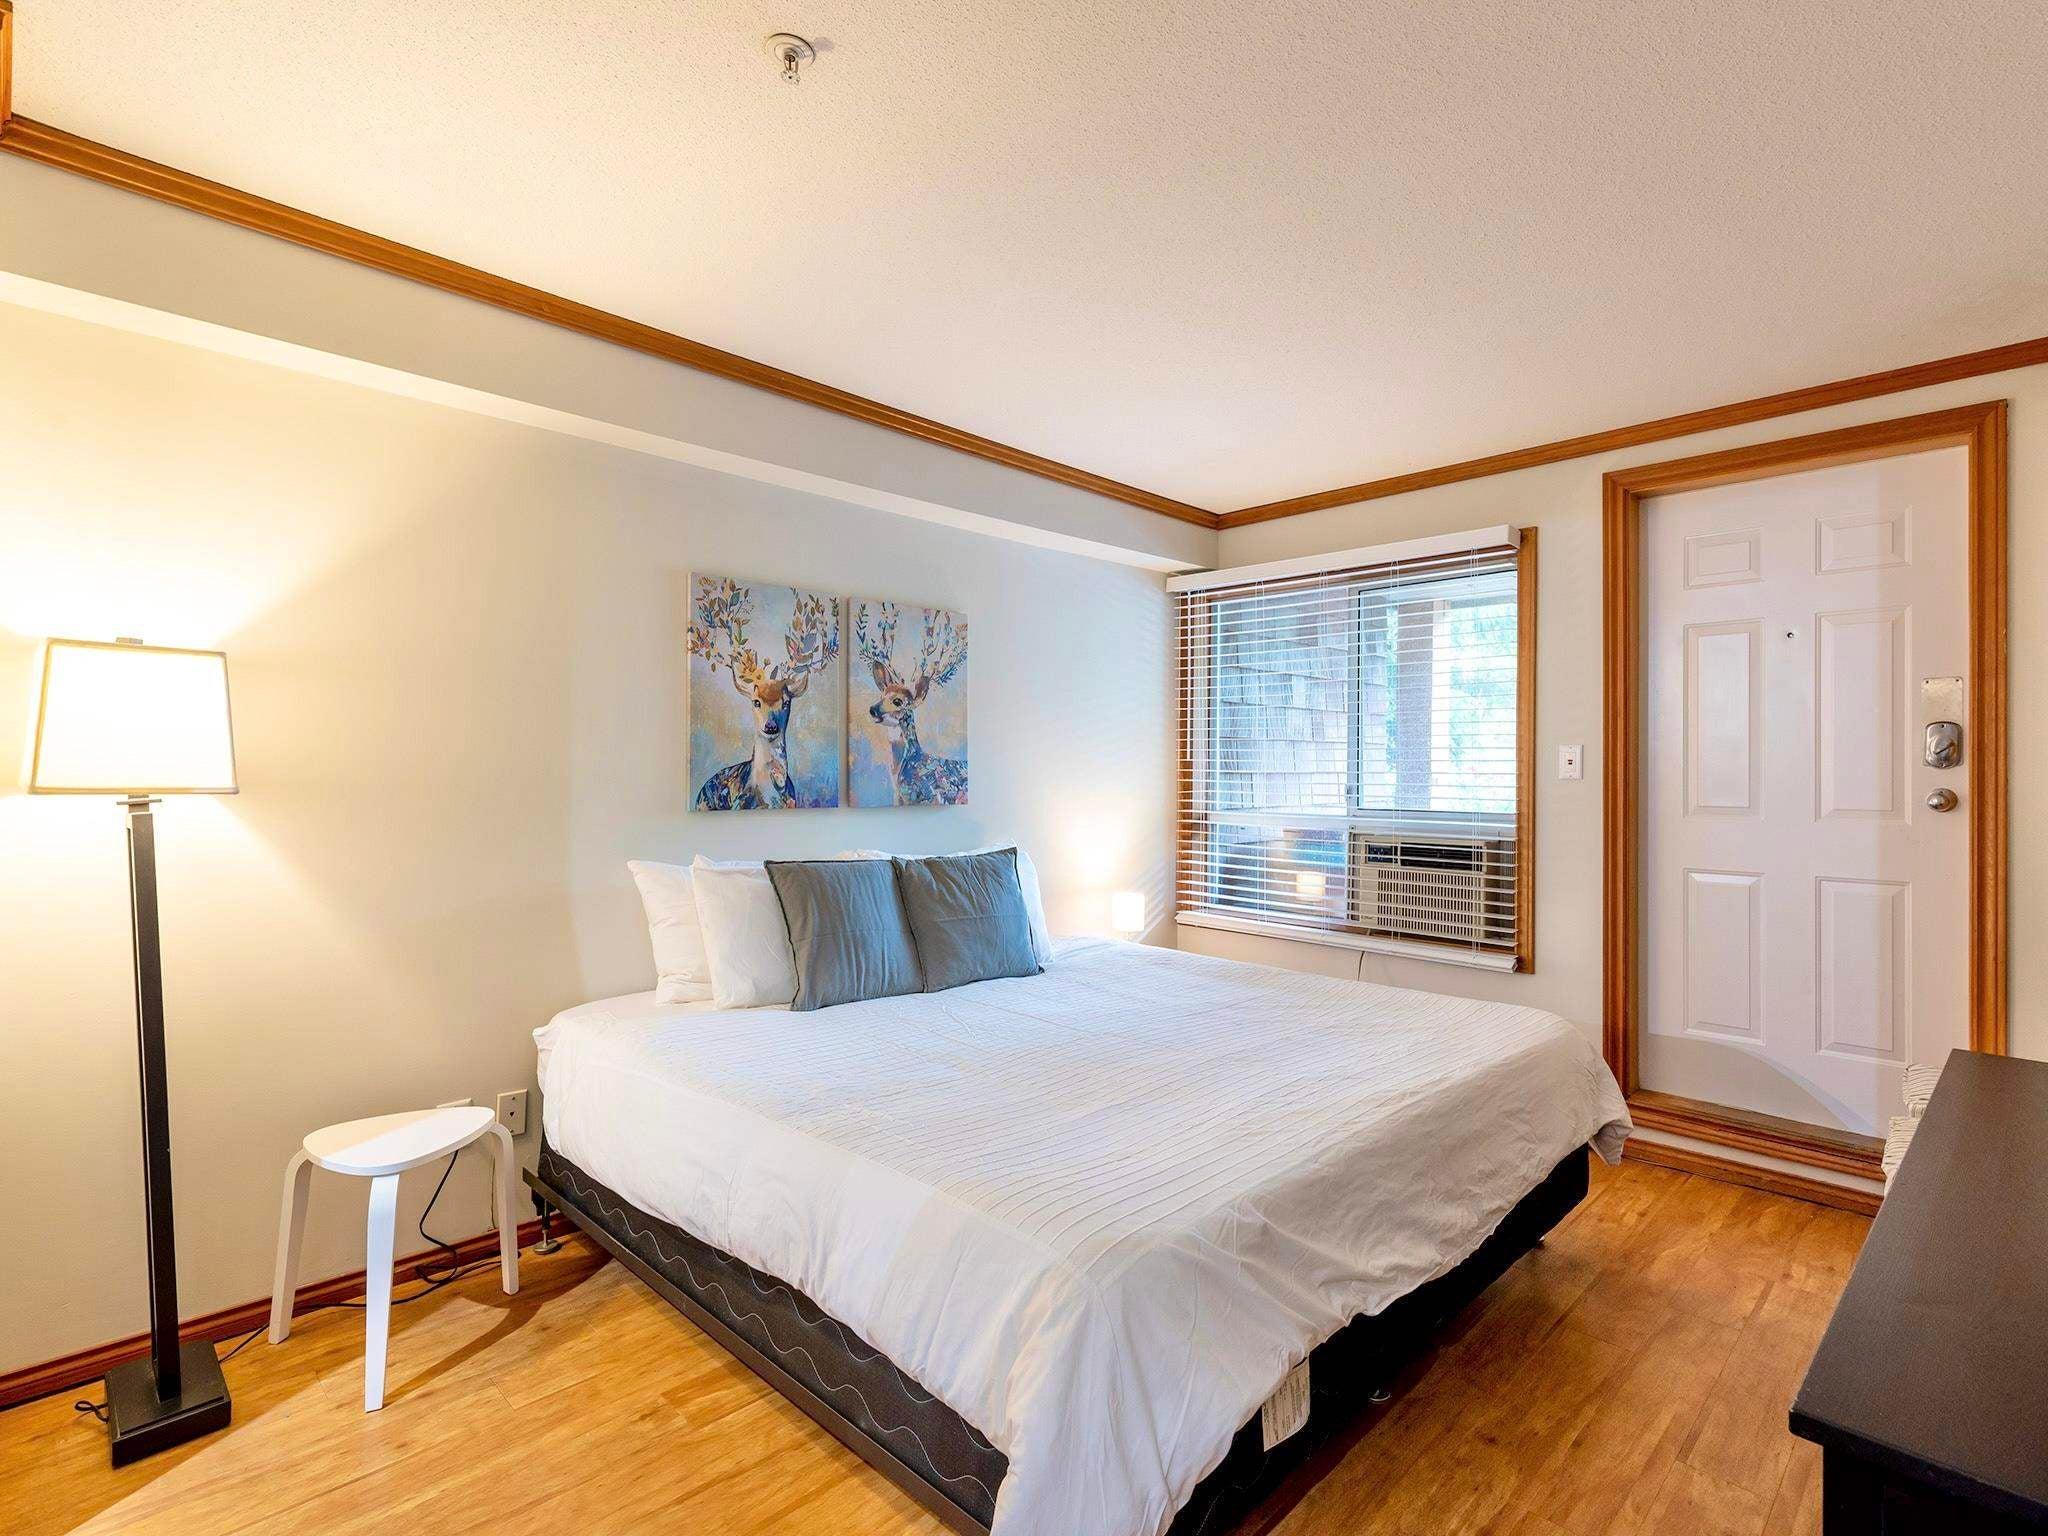 73 4388 NORTHLANDS BOULEVARD - Whistler Village Townhouse for sale, 2 Bedrooms (R2580863) - #10